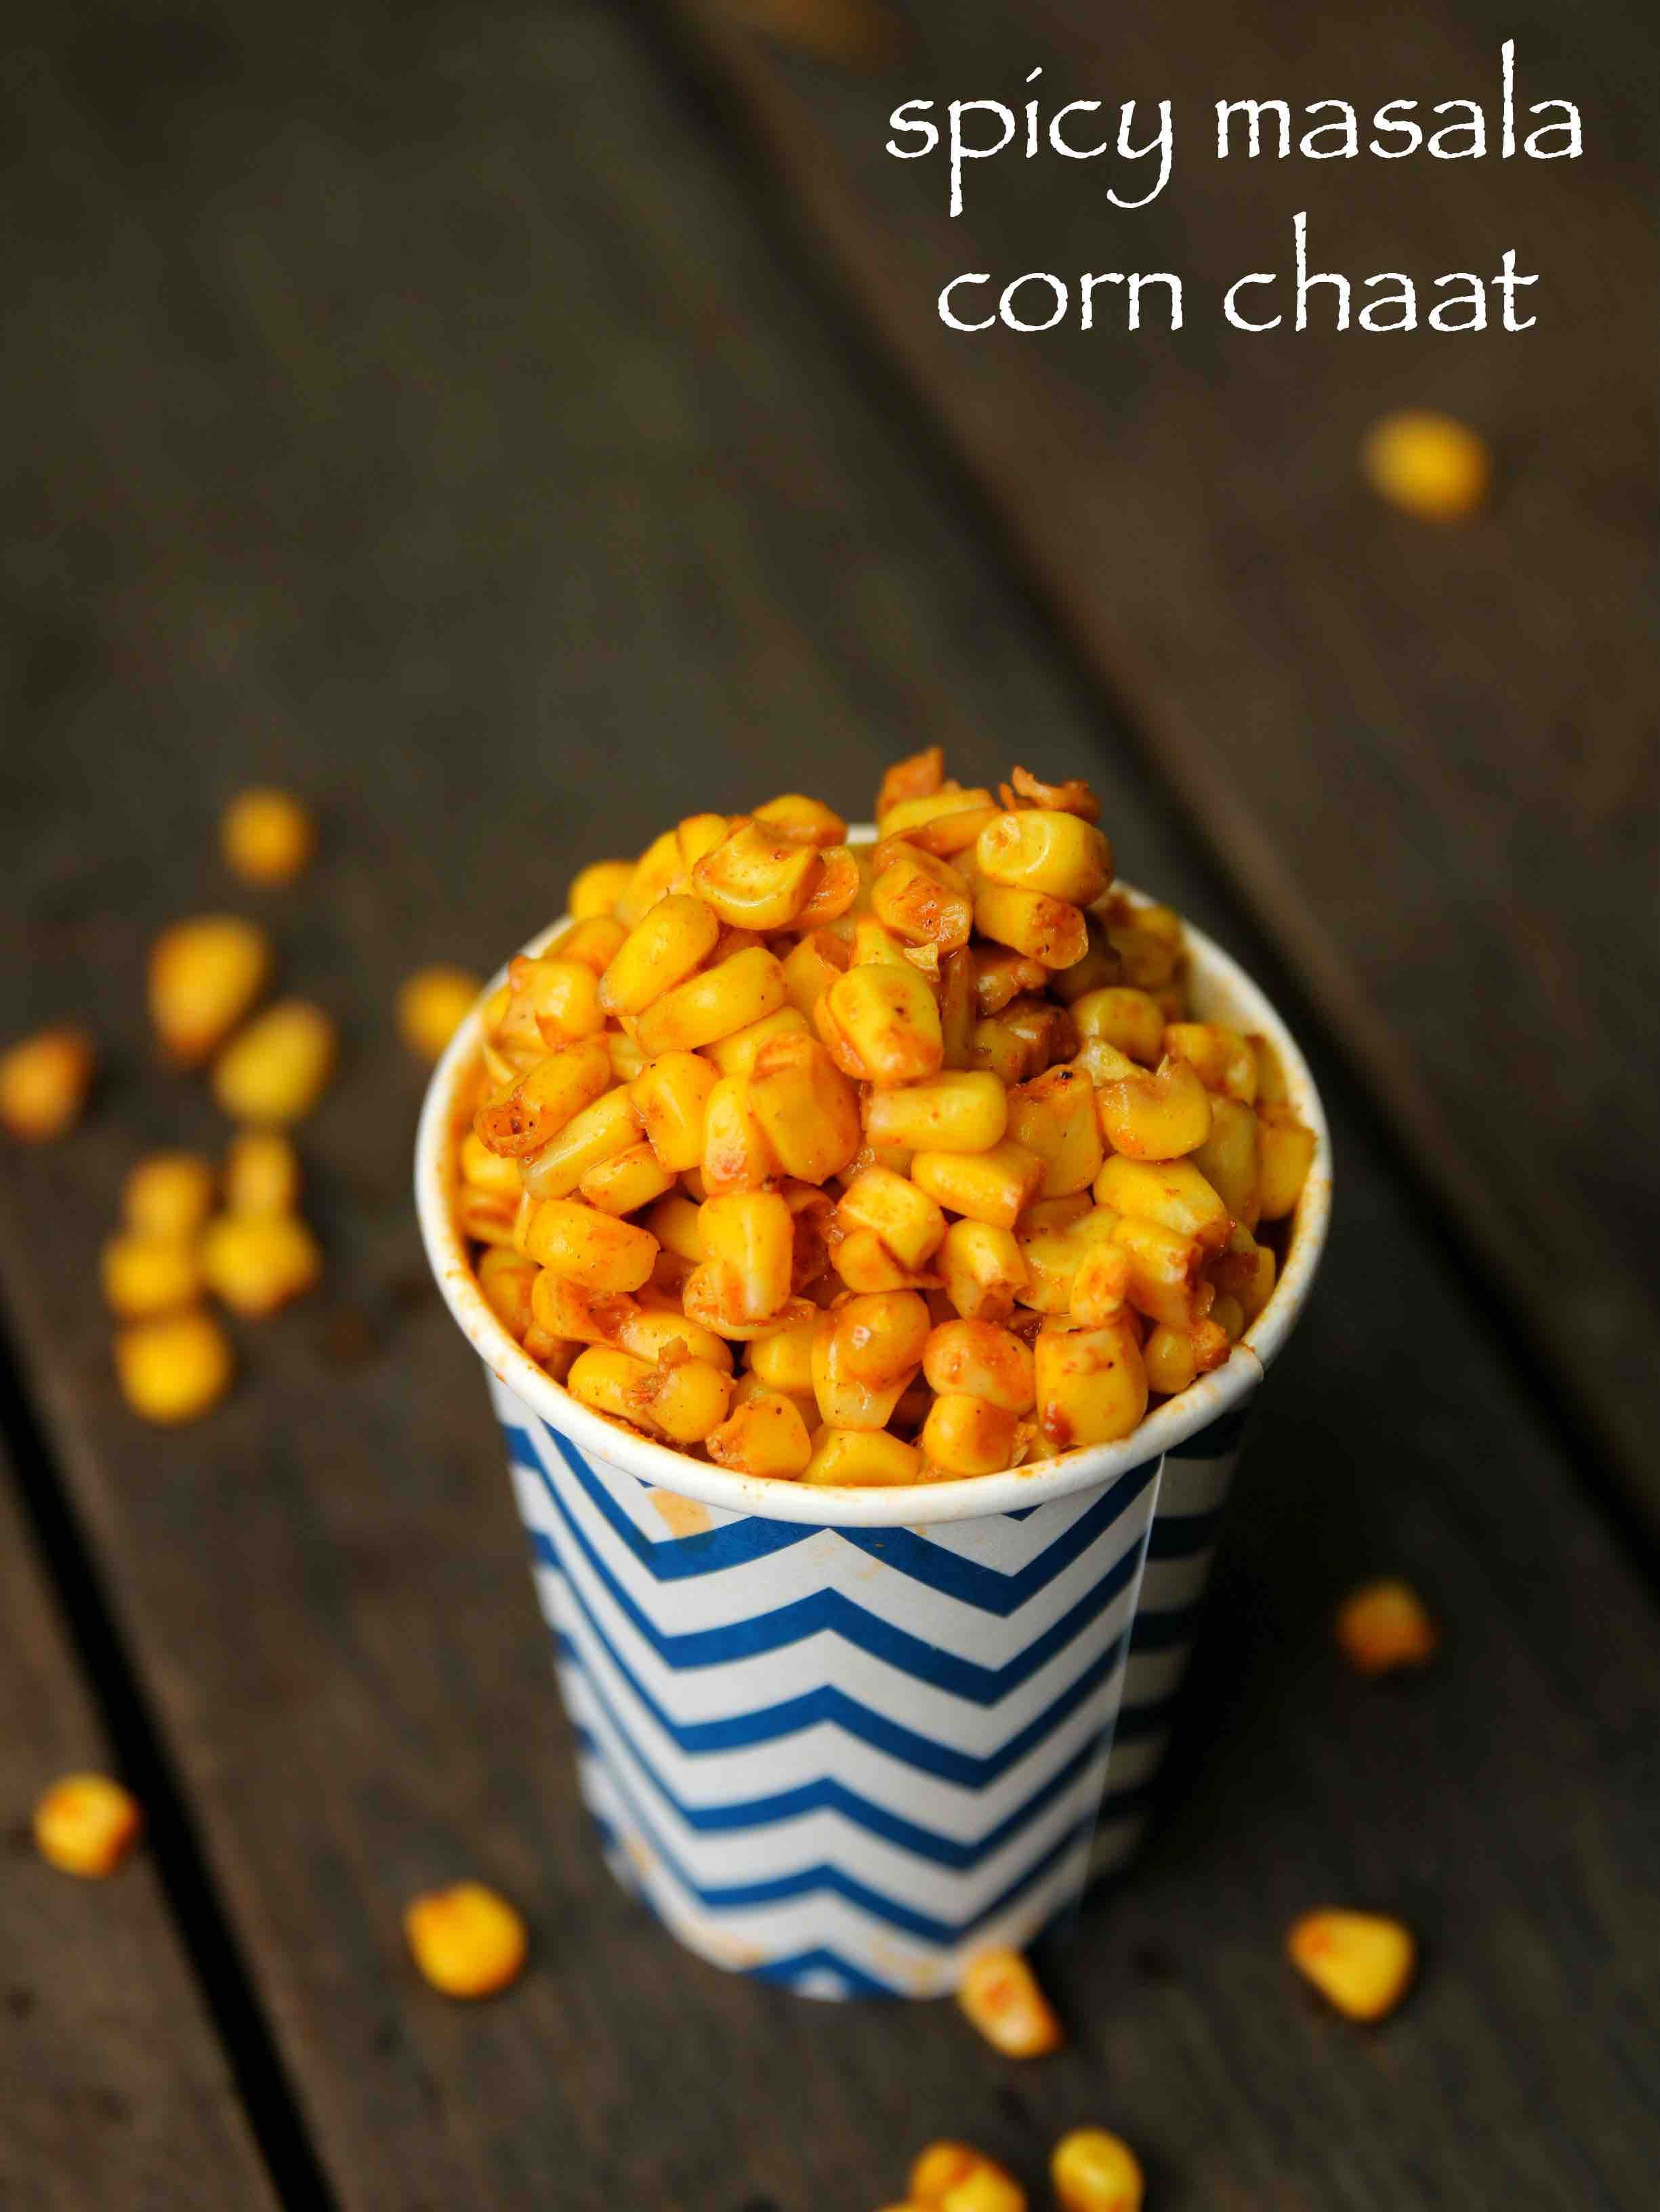 corn chaat recipe | masala corn recipe | spicy swe